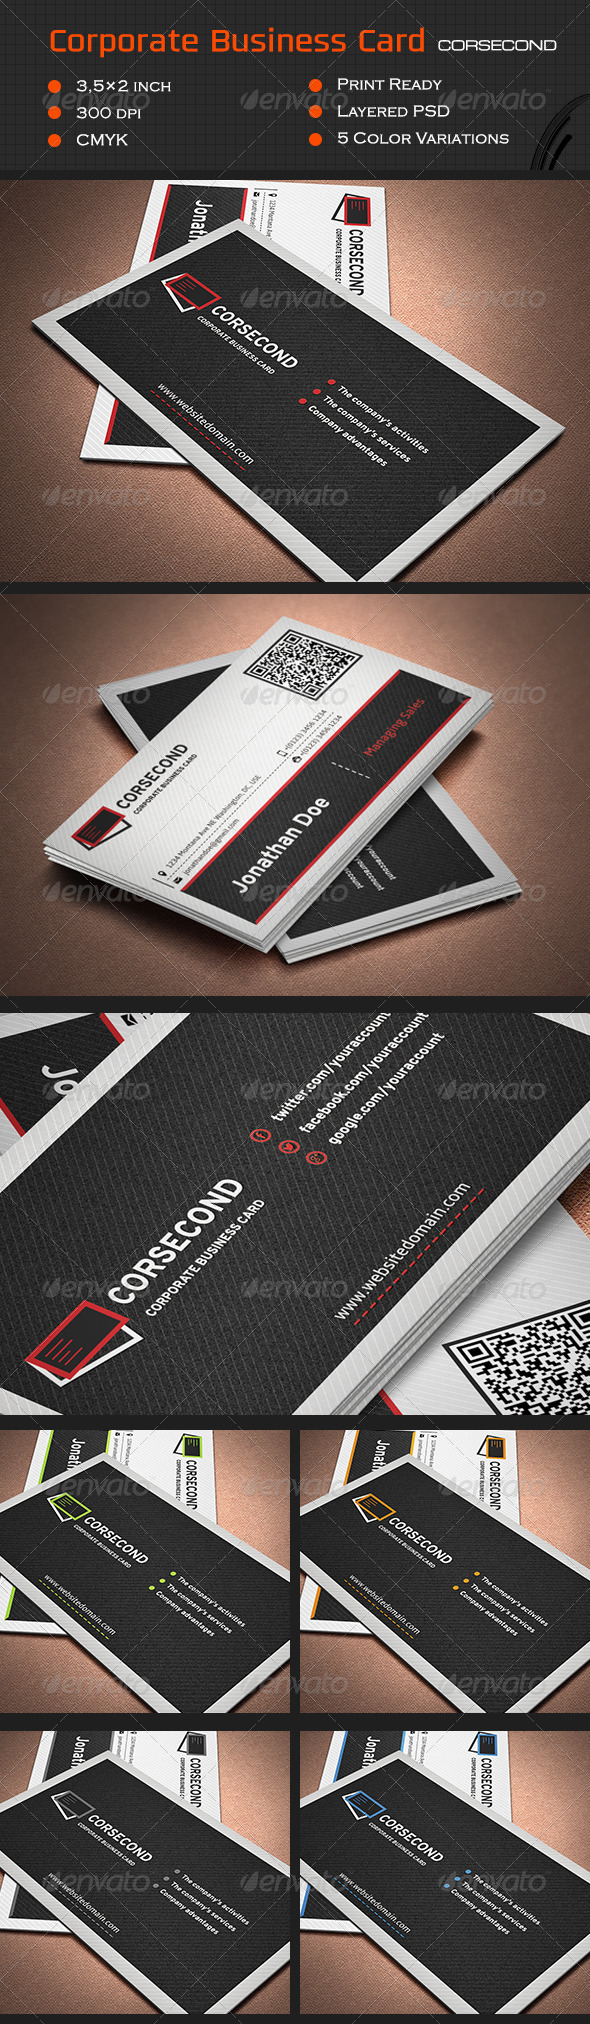 Corporate Business Card Cor2 - Corporate Business Cards